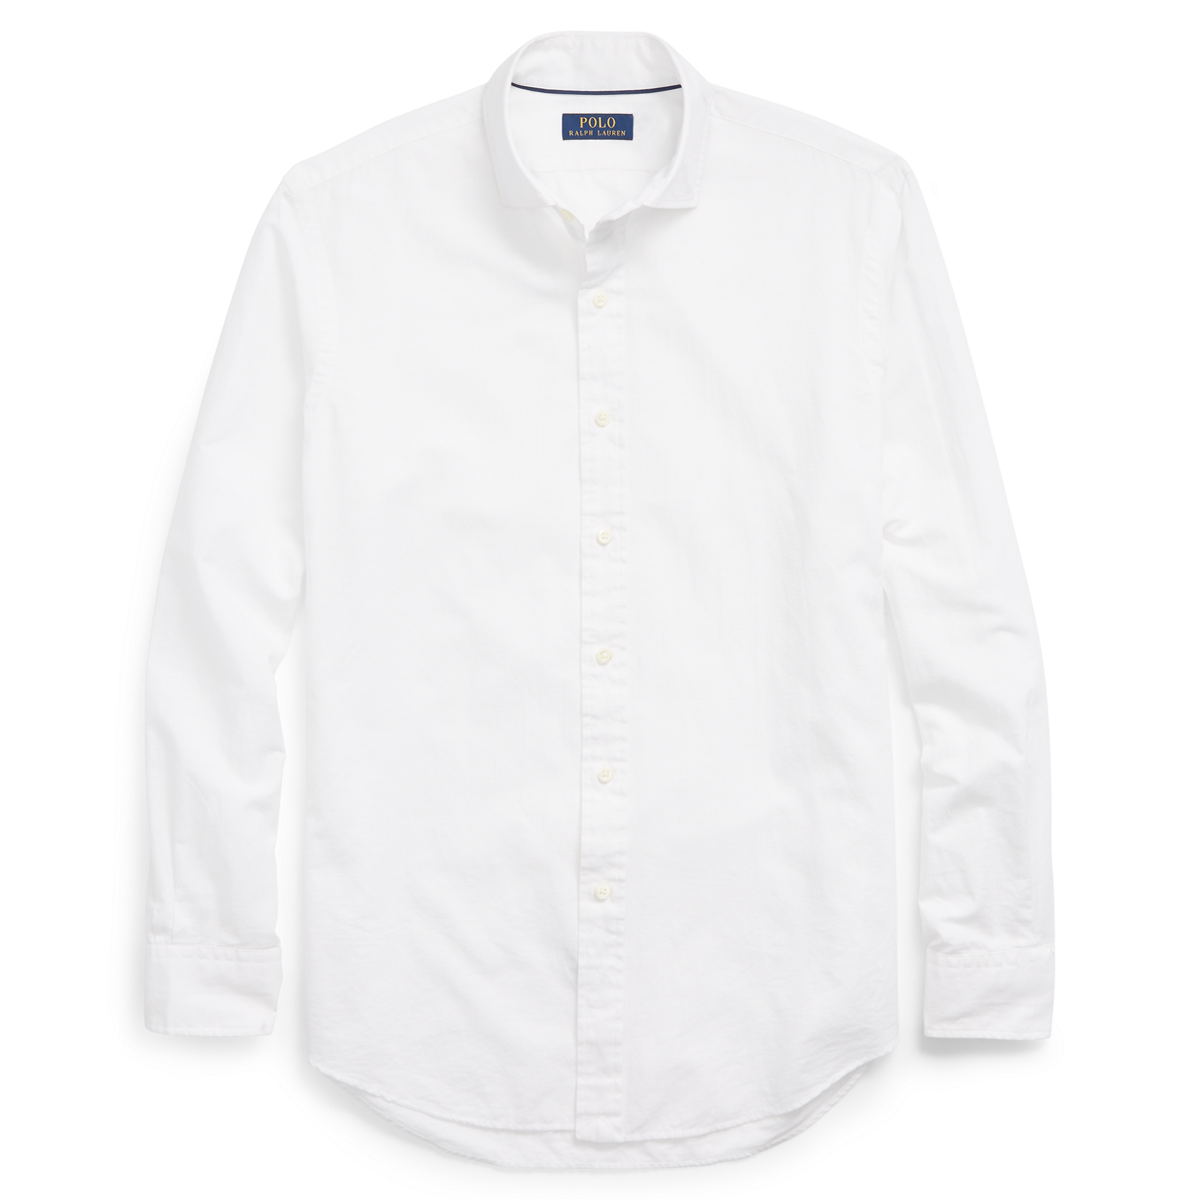 b0dcad2d79e10 Classic Polo Linen Shirts